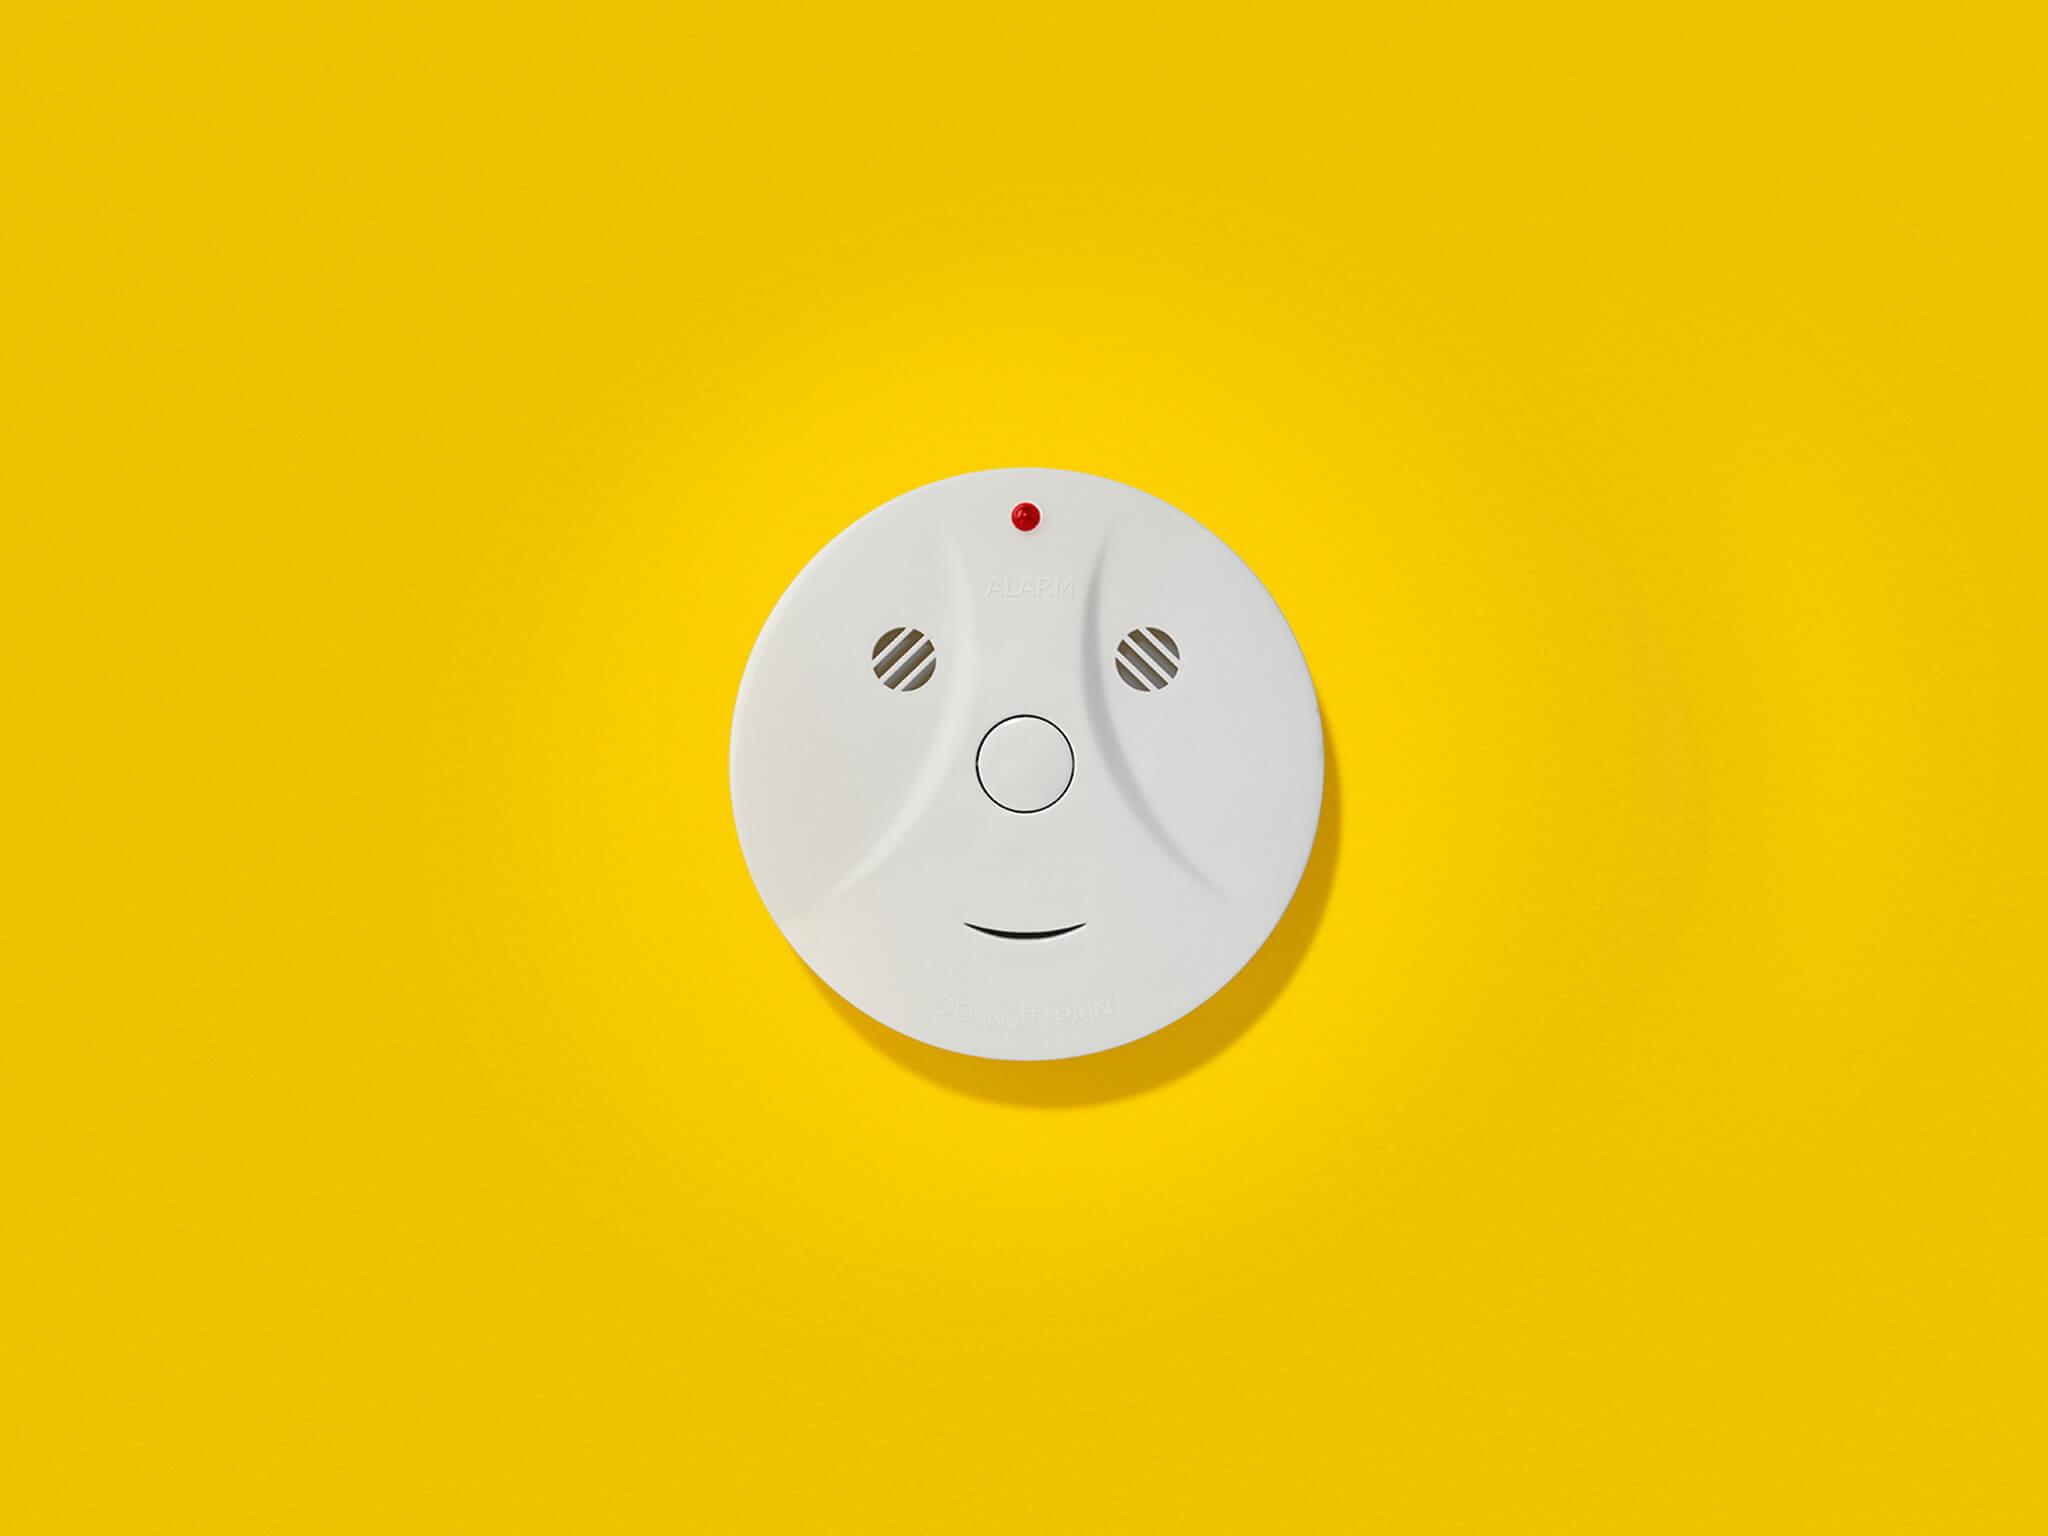 PG Smile amoke alarm